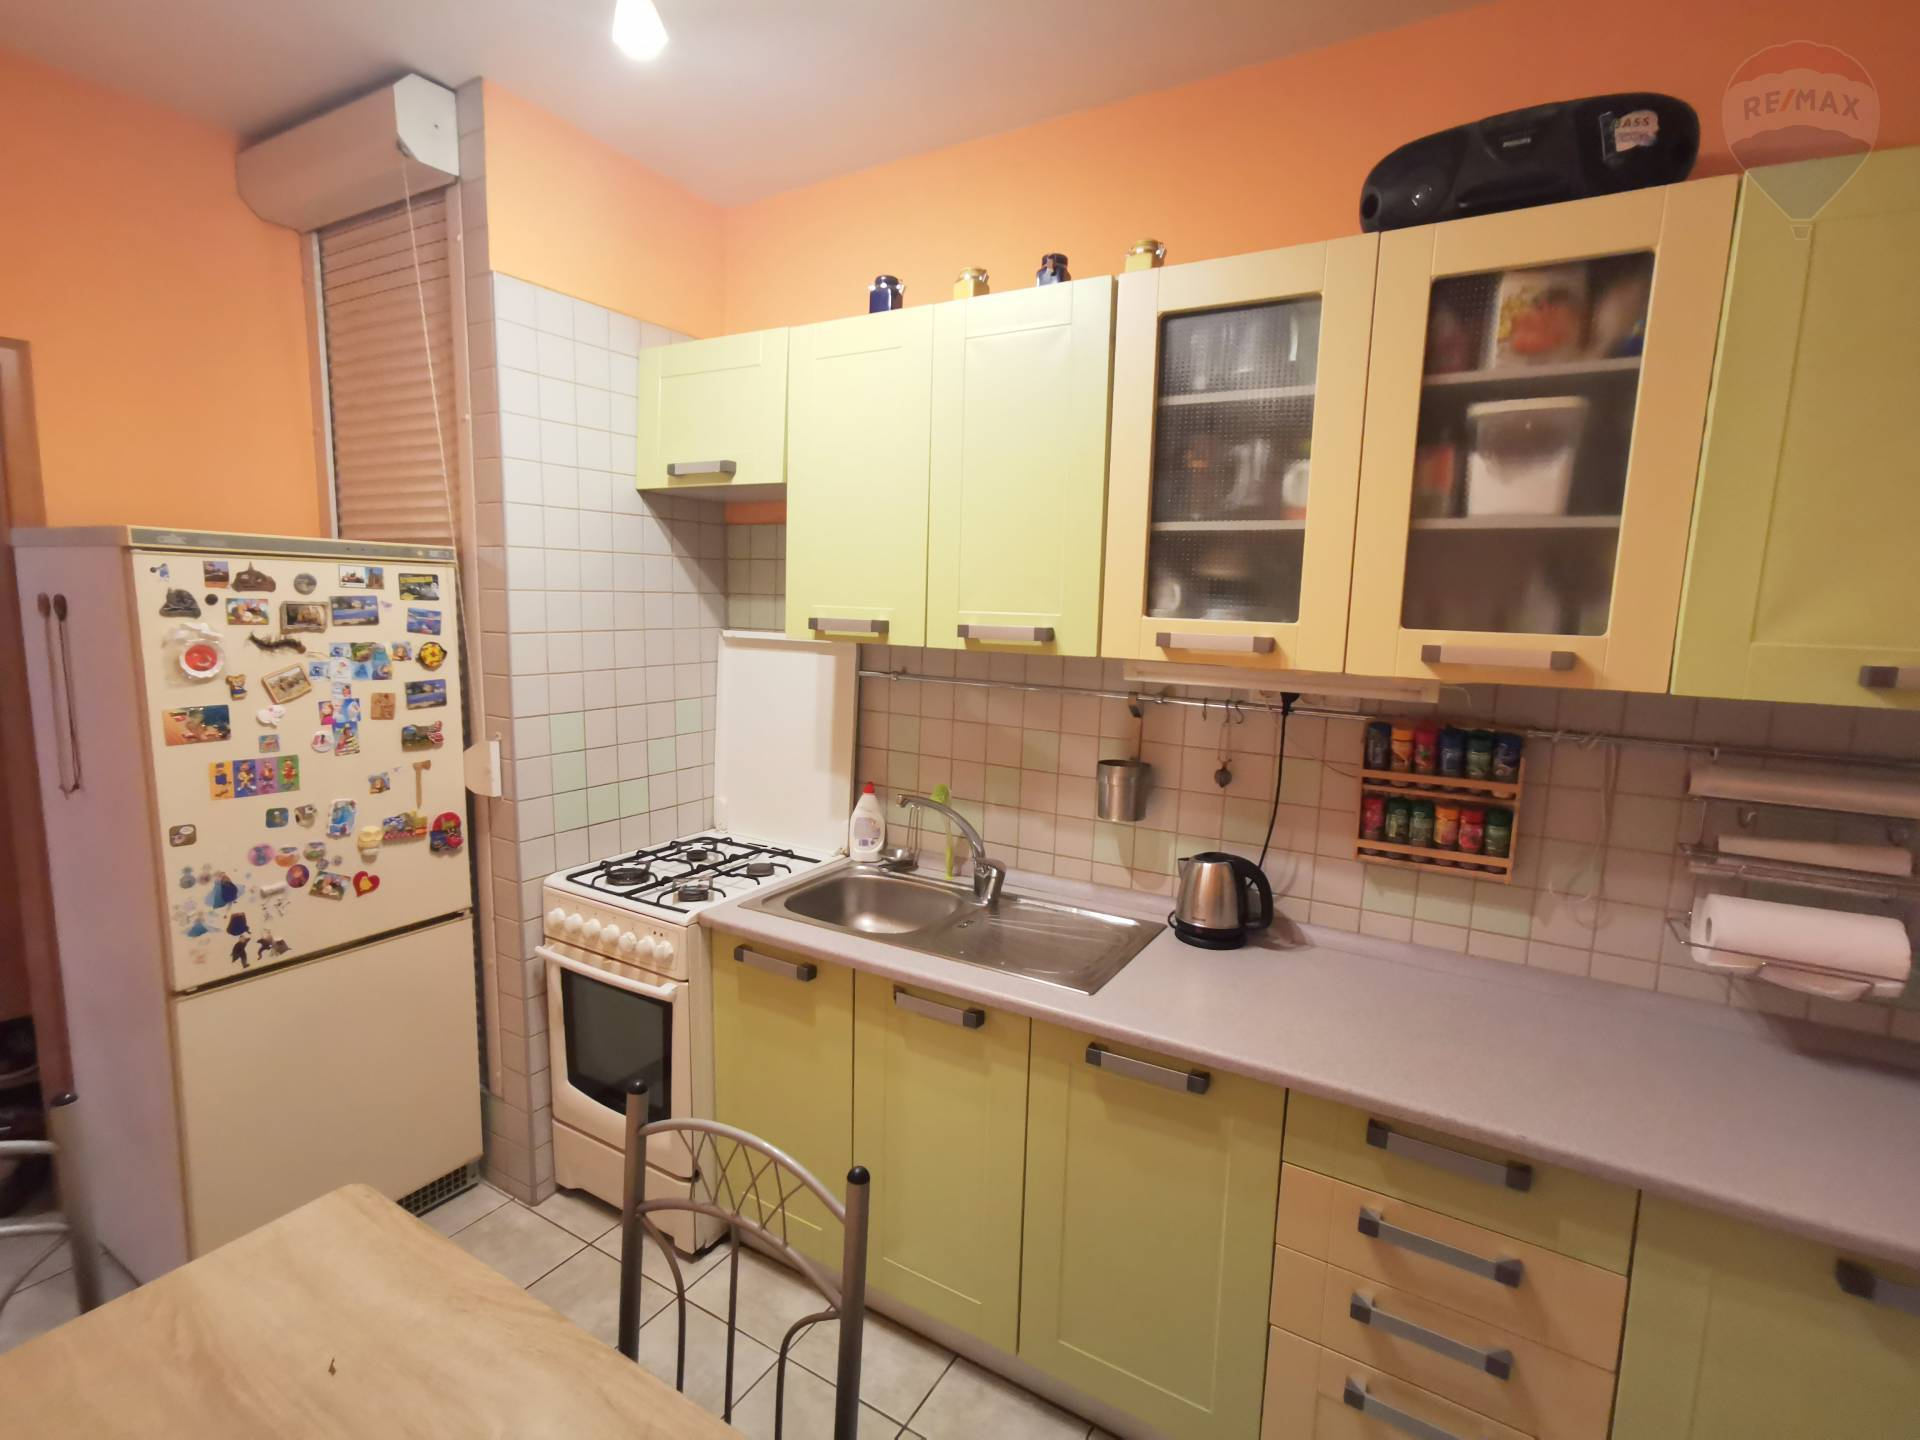 3 - izbový zrekonštruovaný byt - Zapotôčky